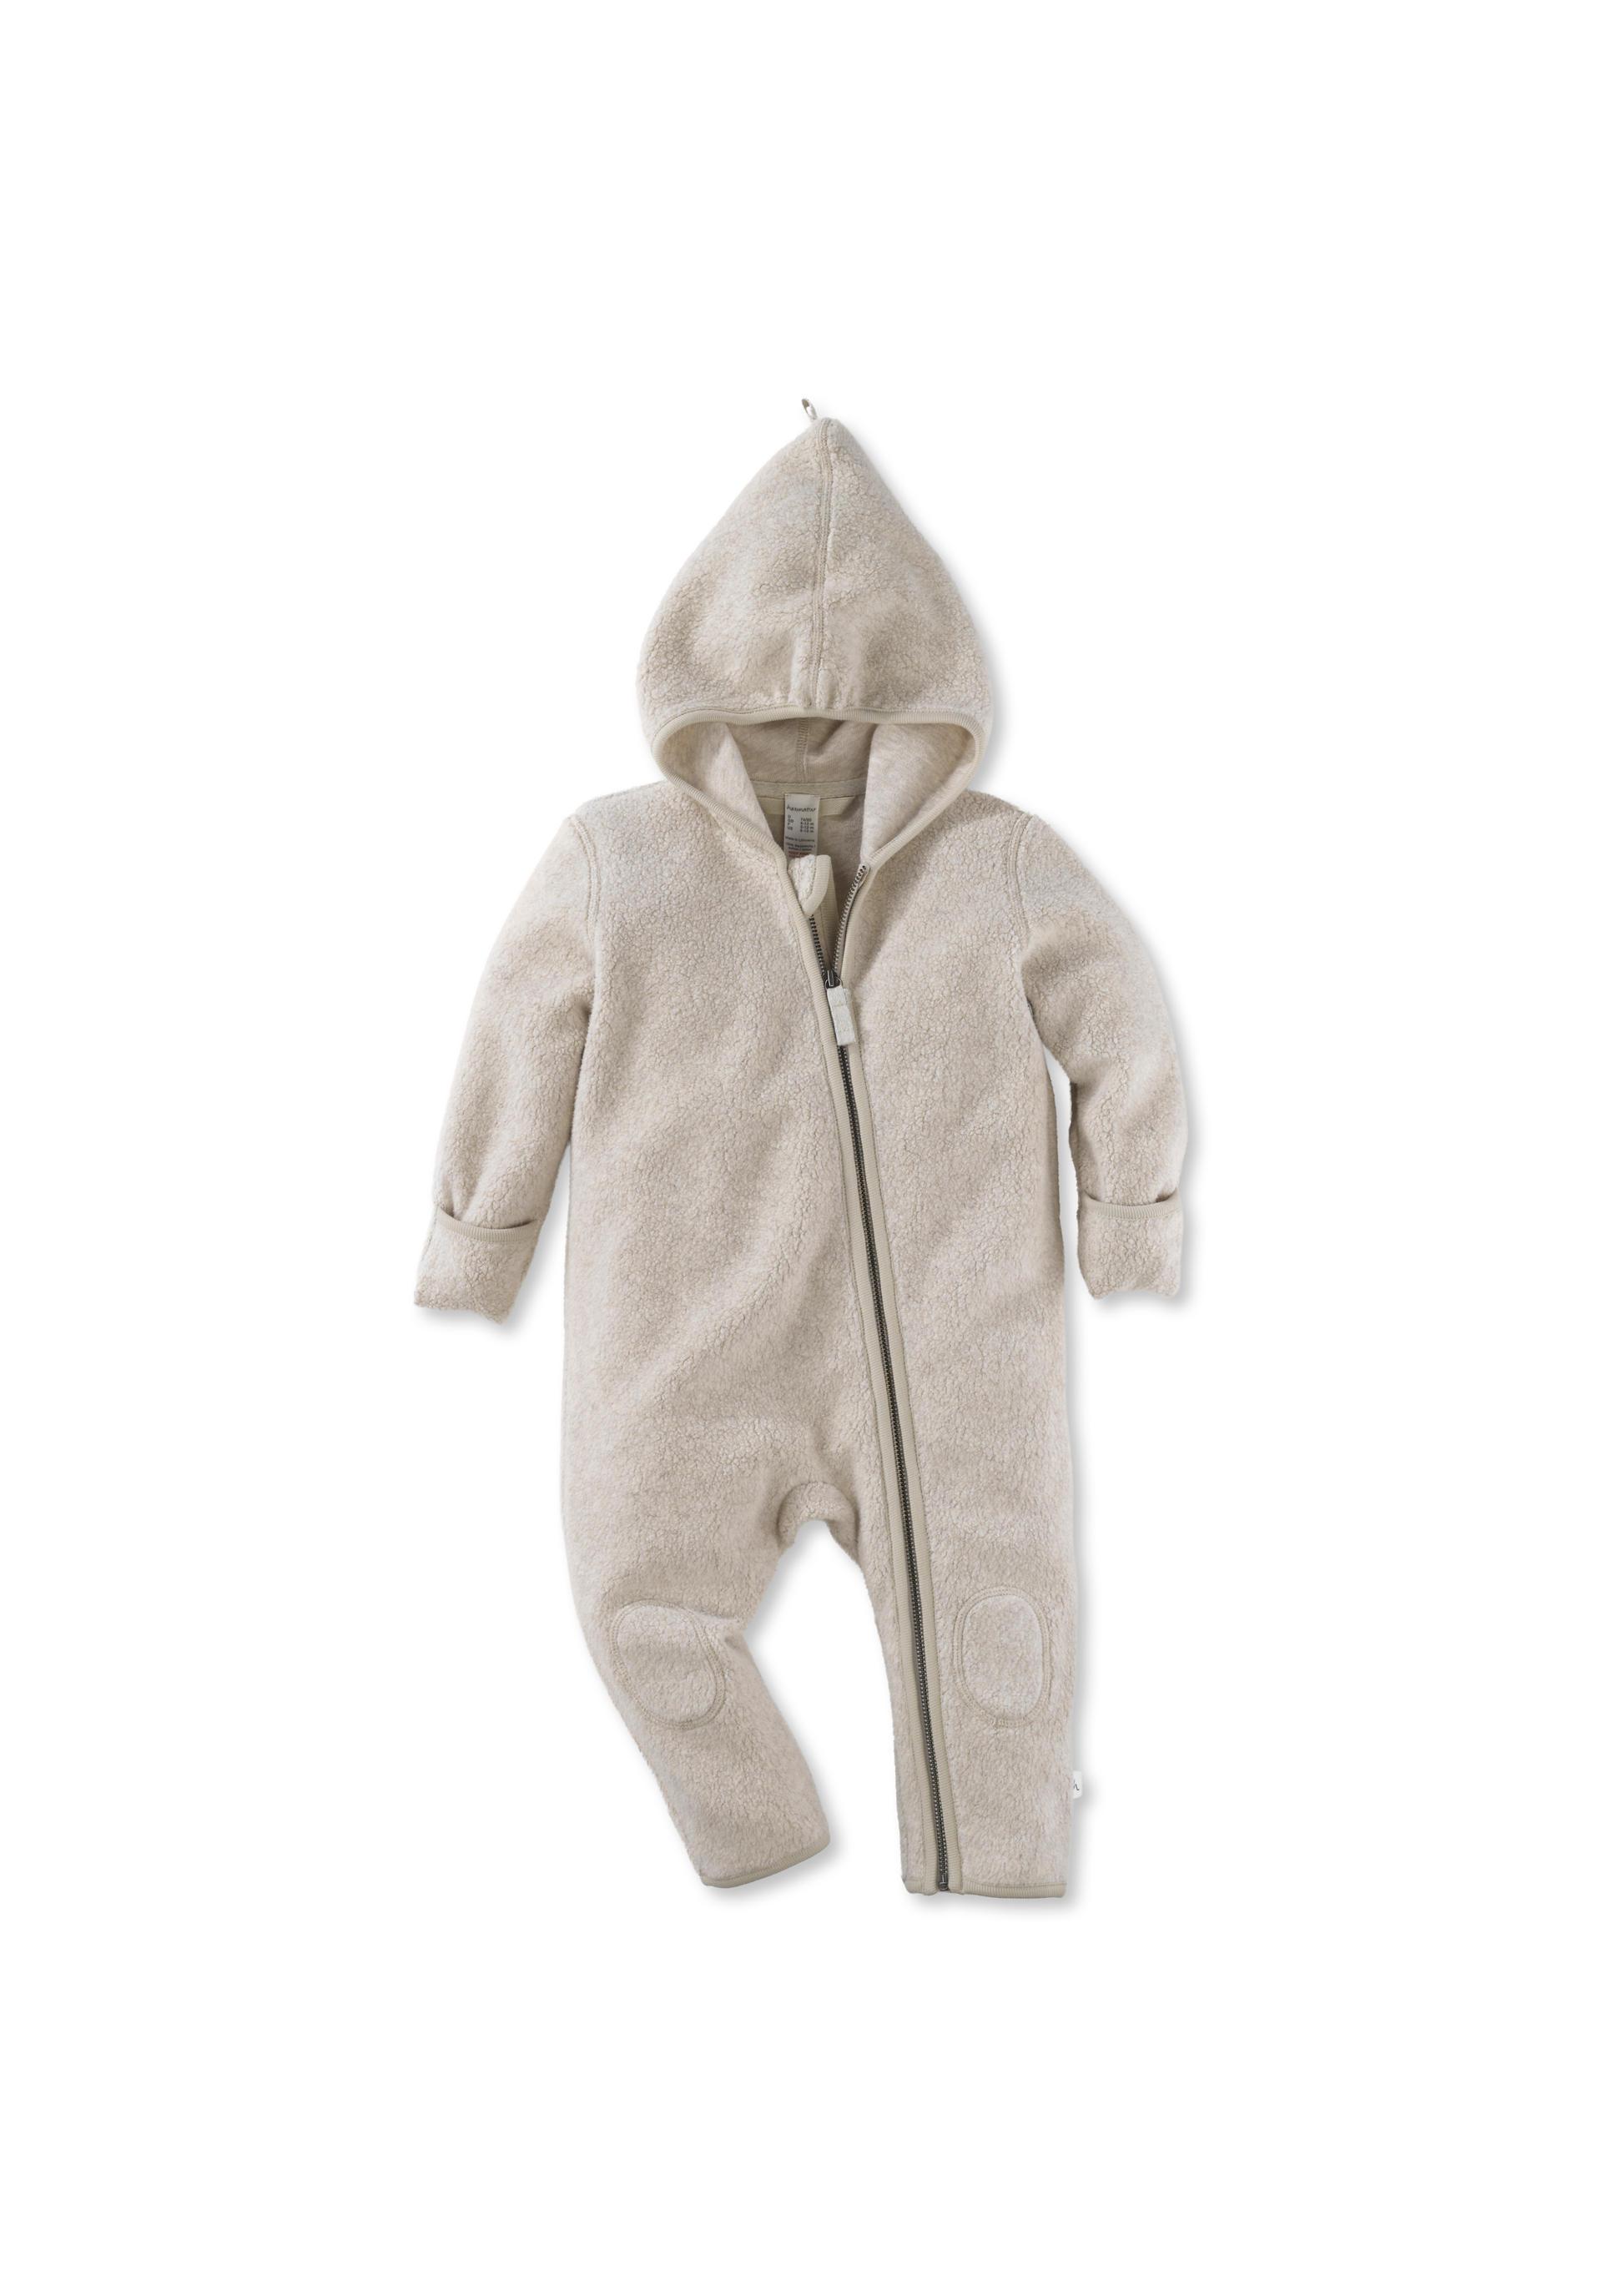 57500846aacd8a Fleece Overall aus reiner Bio-Baumwolle - hessnatur Deutschland